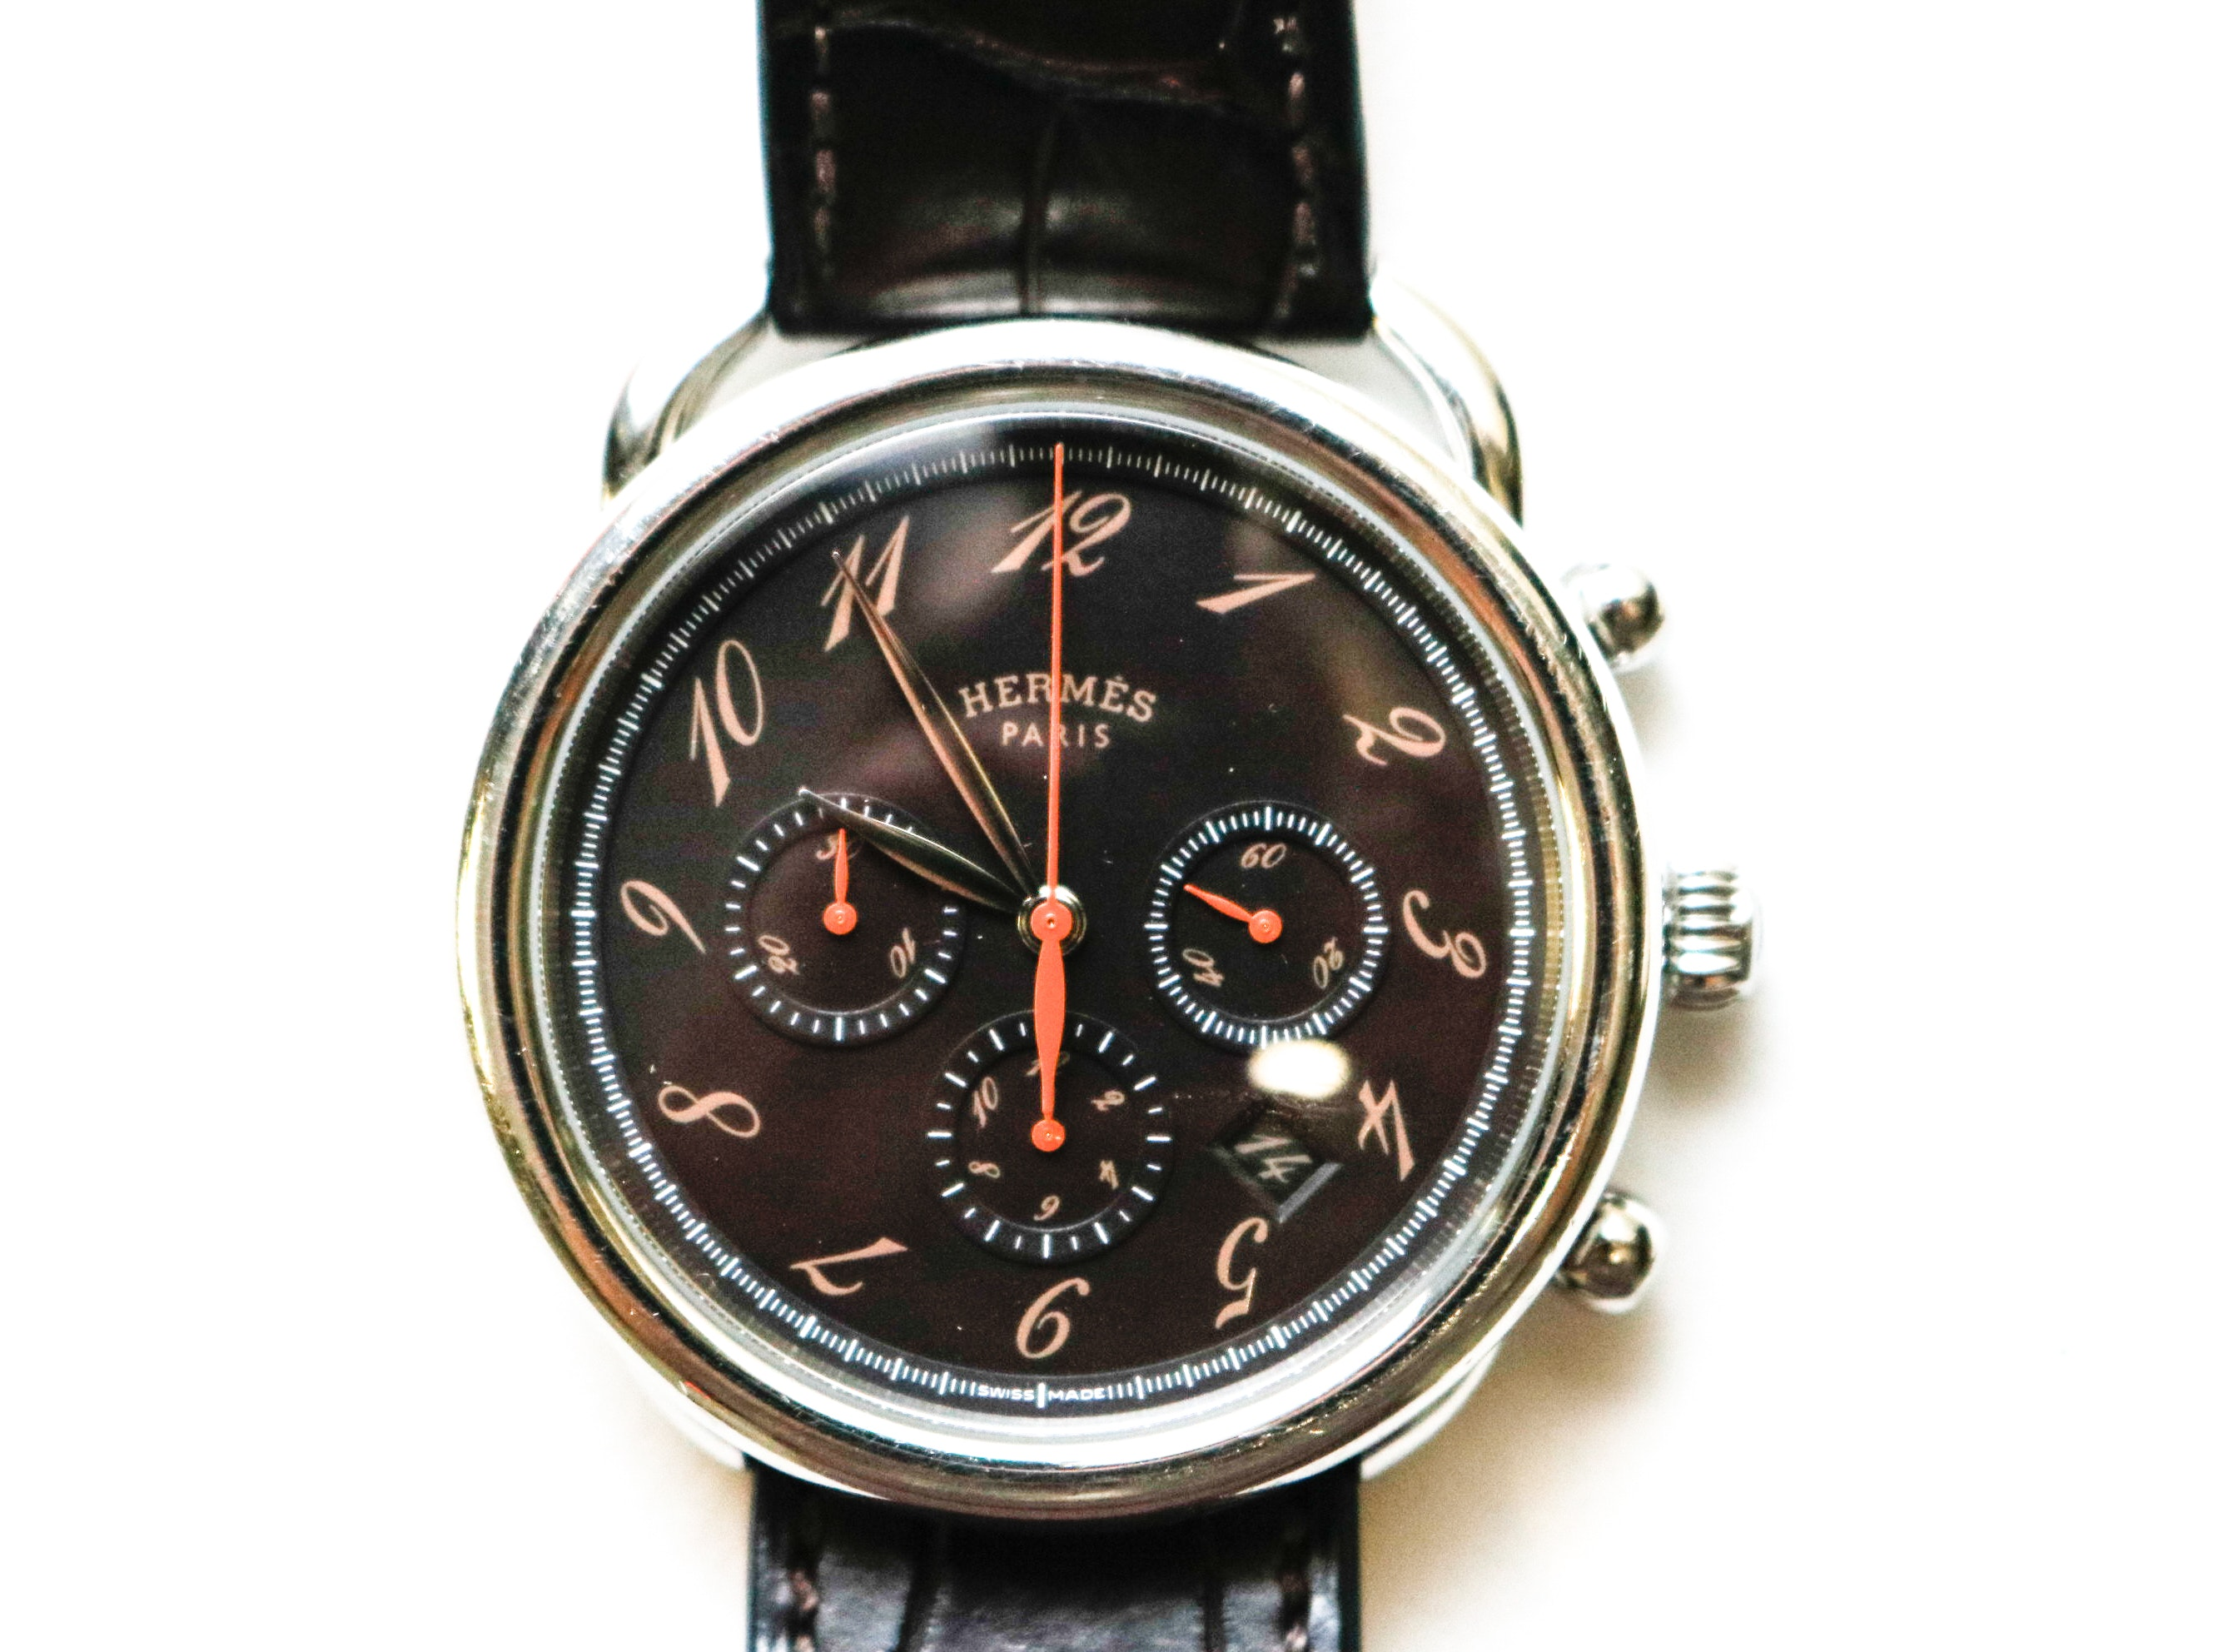 Hermes Chronograph Wristwatch in Original Box